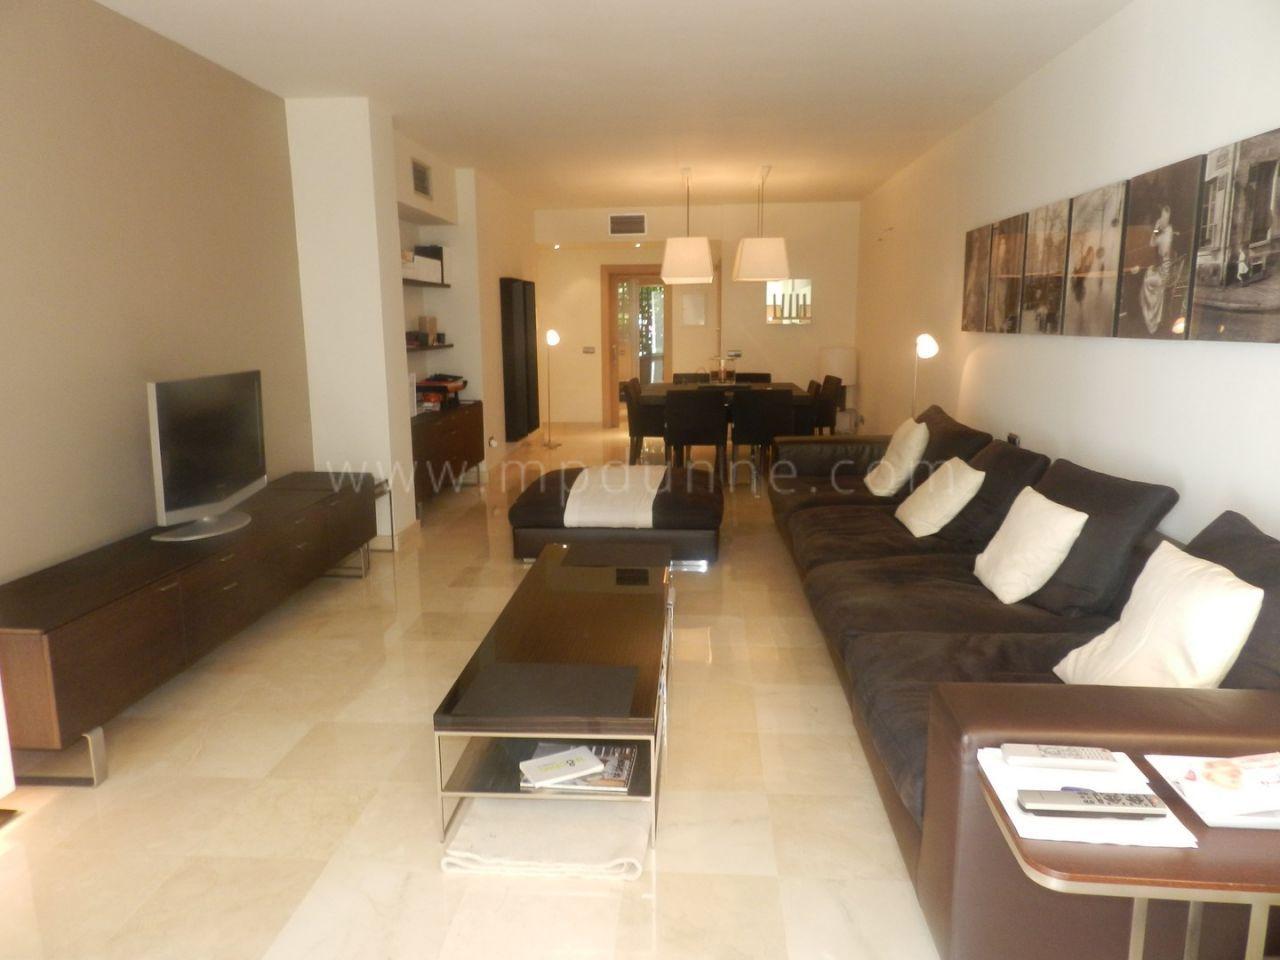 bel appartement enti rement r nov vendre puerto banus. Black Bedroom Furniture Sets. Home Design Ideas